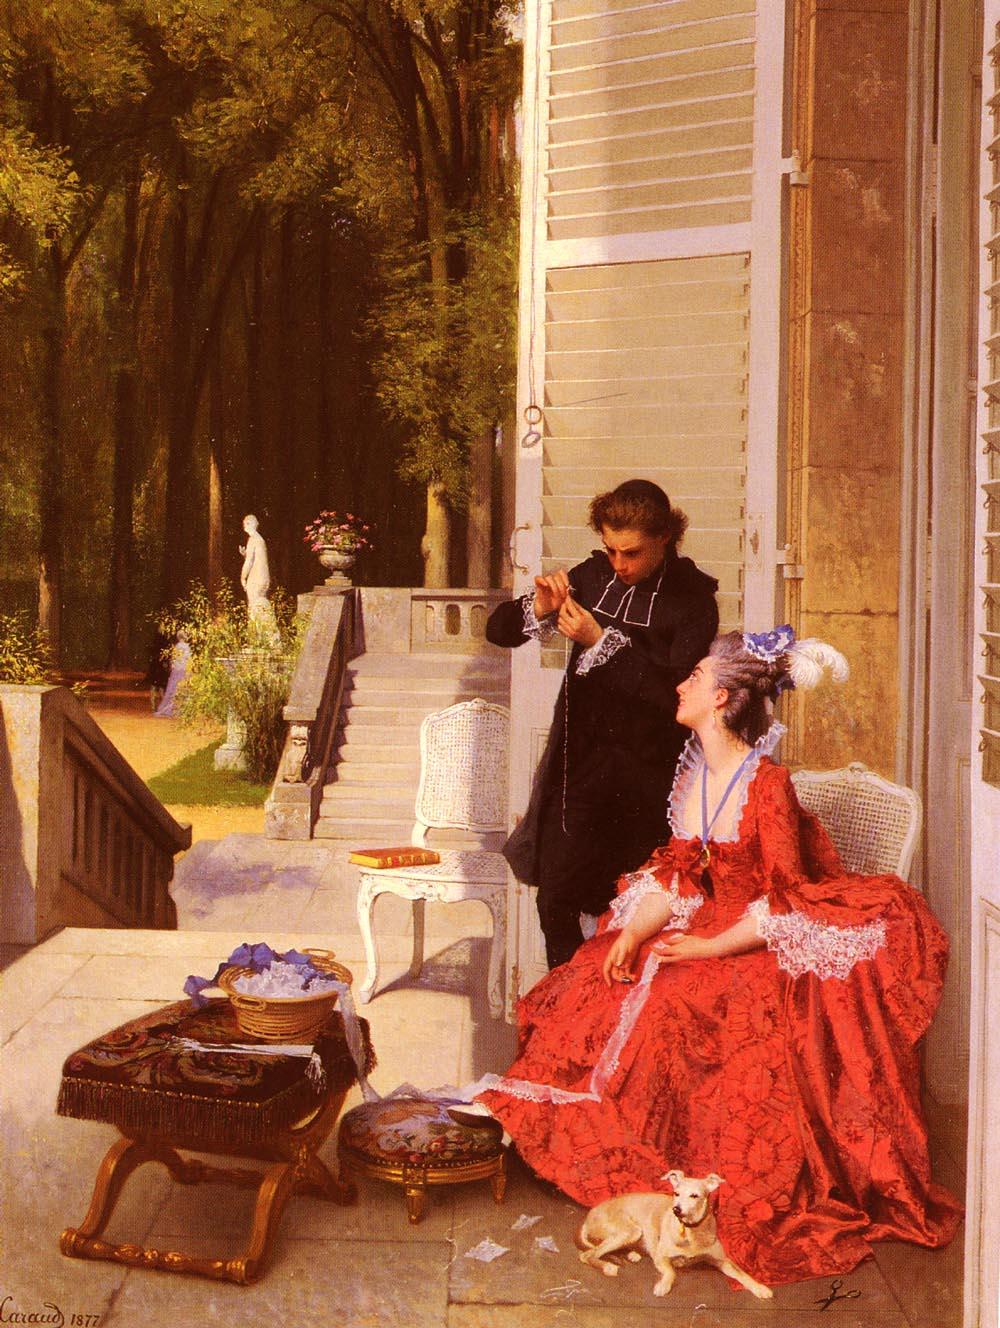 The Obliging Abb :: Joseph Caraud - Romantic scenes in art and painting ôîòî